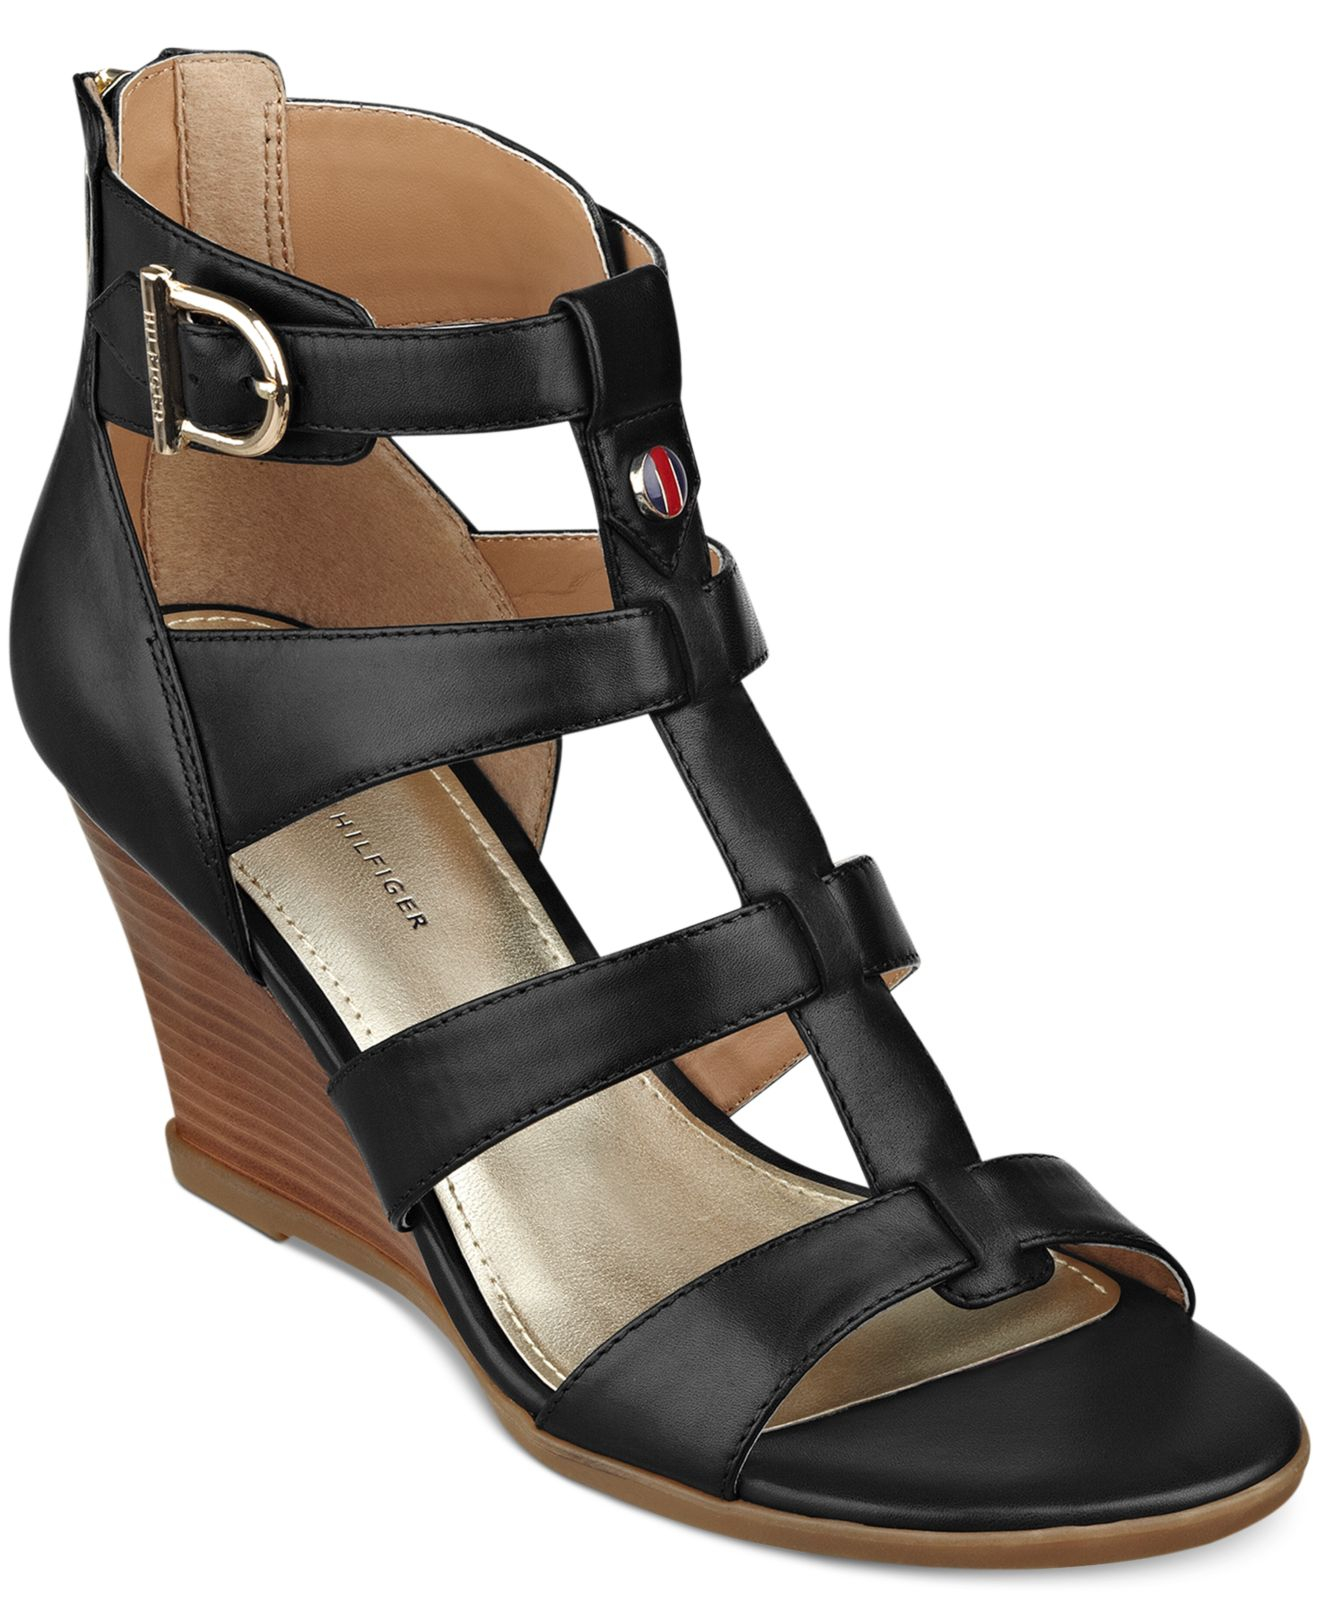 838250b0ddb9e1 Lyst - Tommy Hilfiger Osiana Wedge Sandals in Black